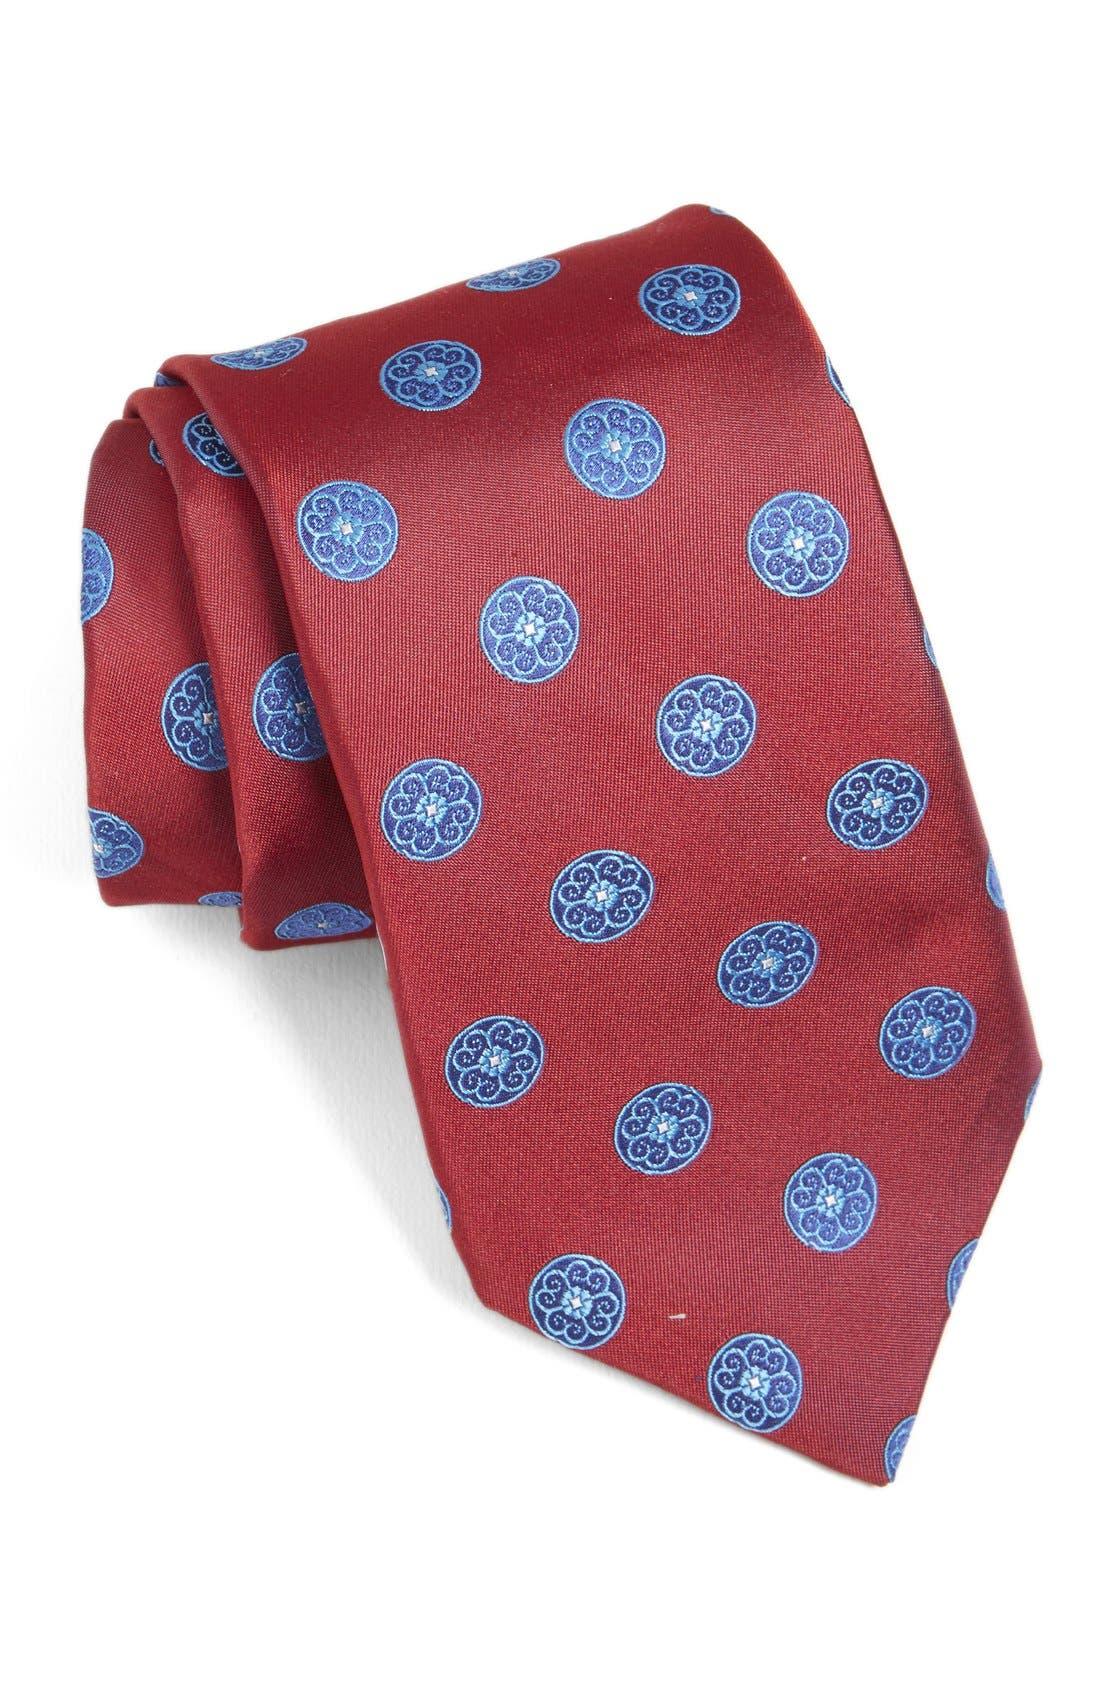 Alternate Image 1 Selected - Ted Baker London Medallion Woven Silk Tie